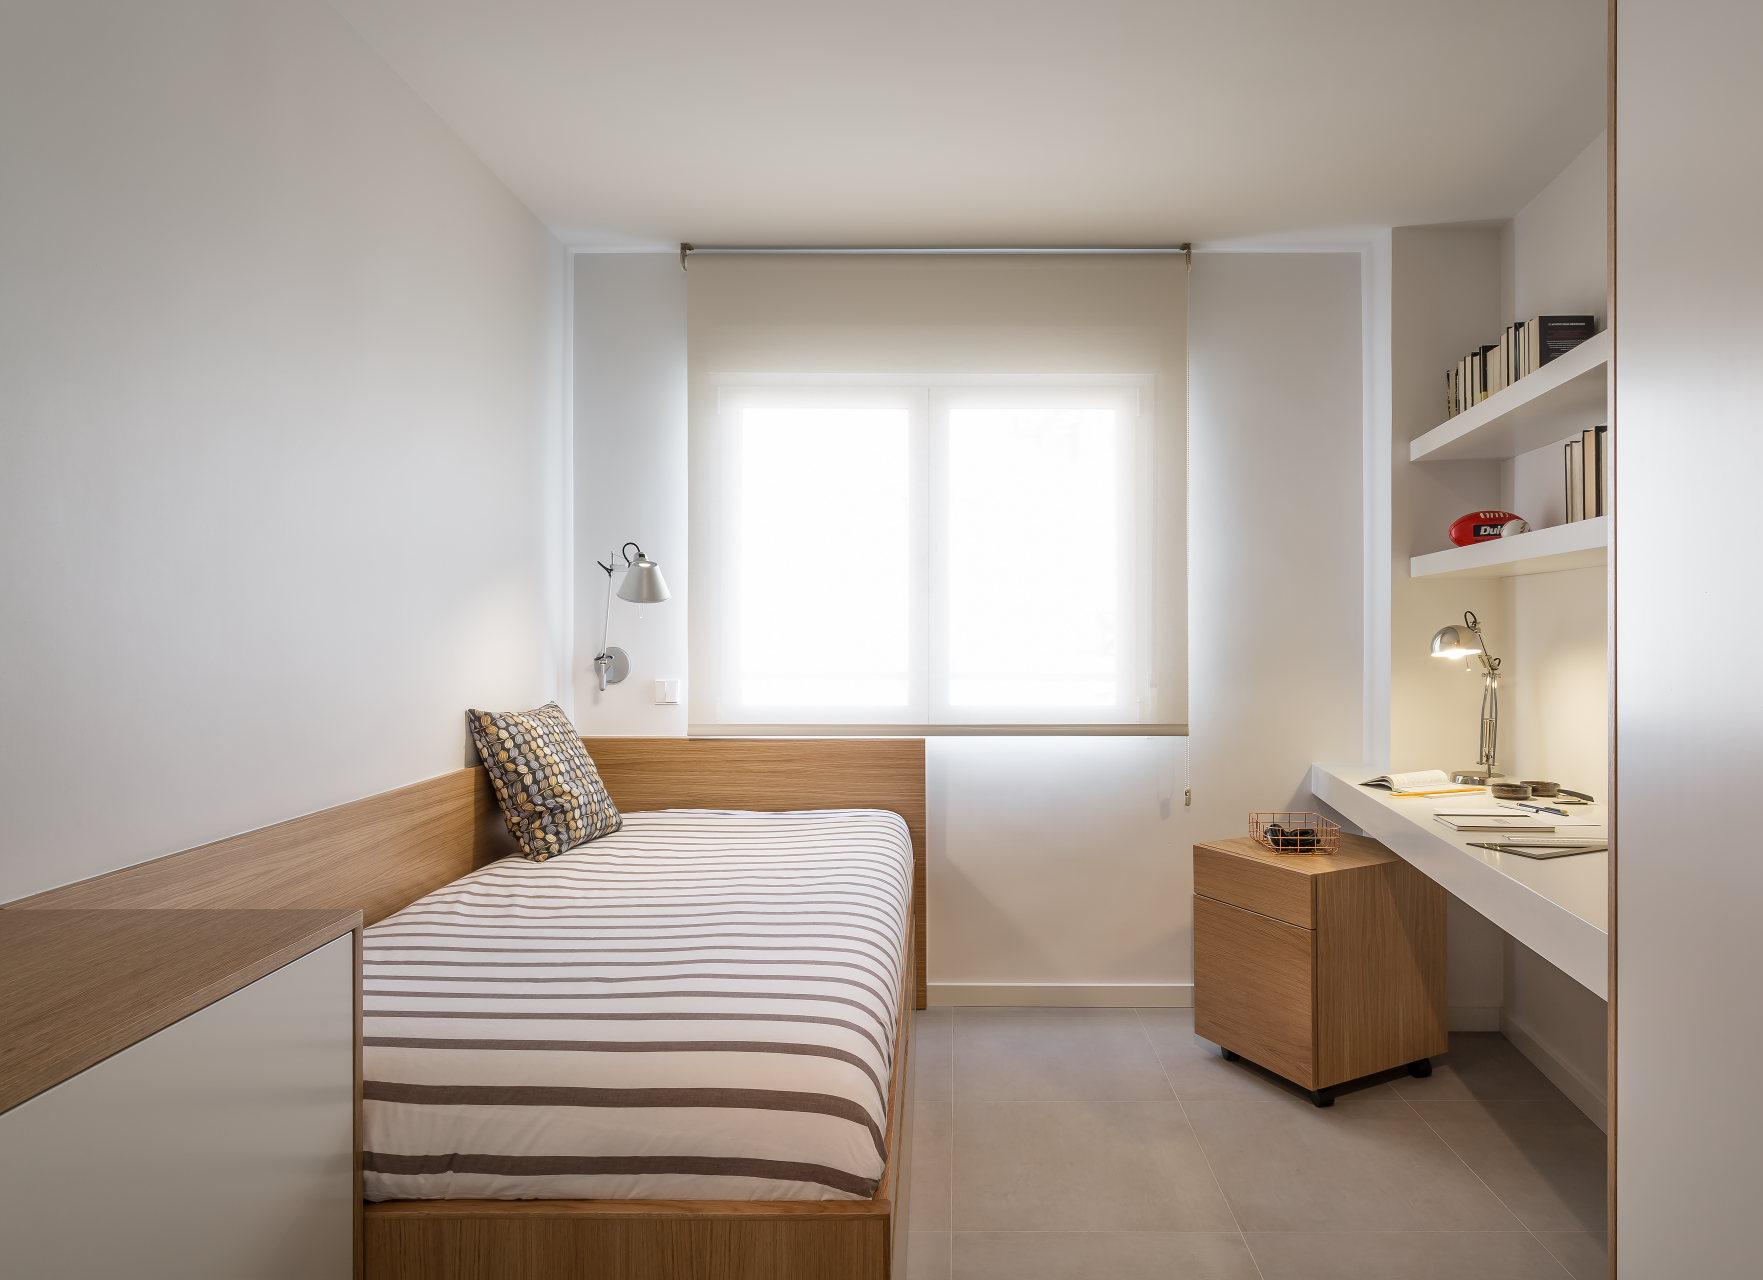 fotografia-arquitectura-interiorismo-valencia-fenollar-german-cabo-laura-yerpes (25)